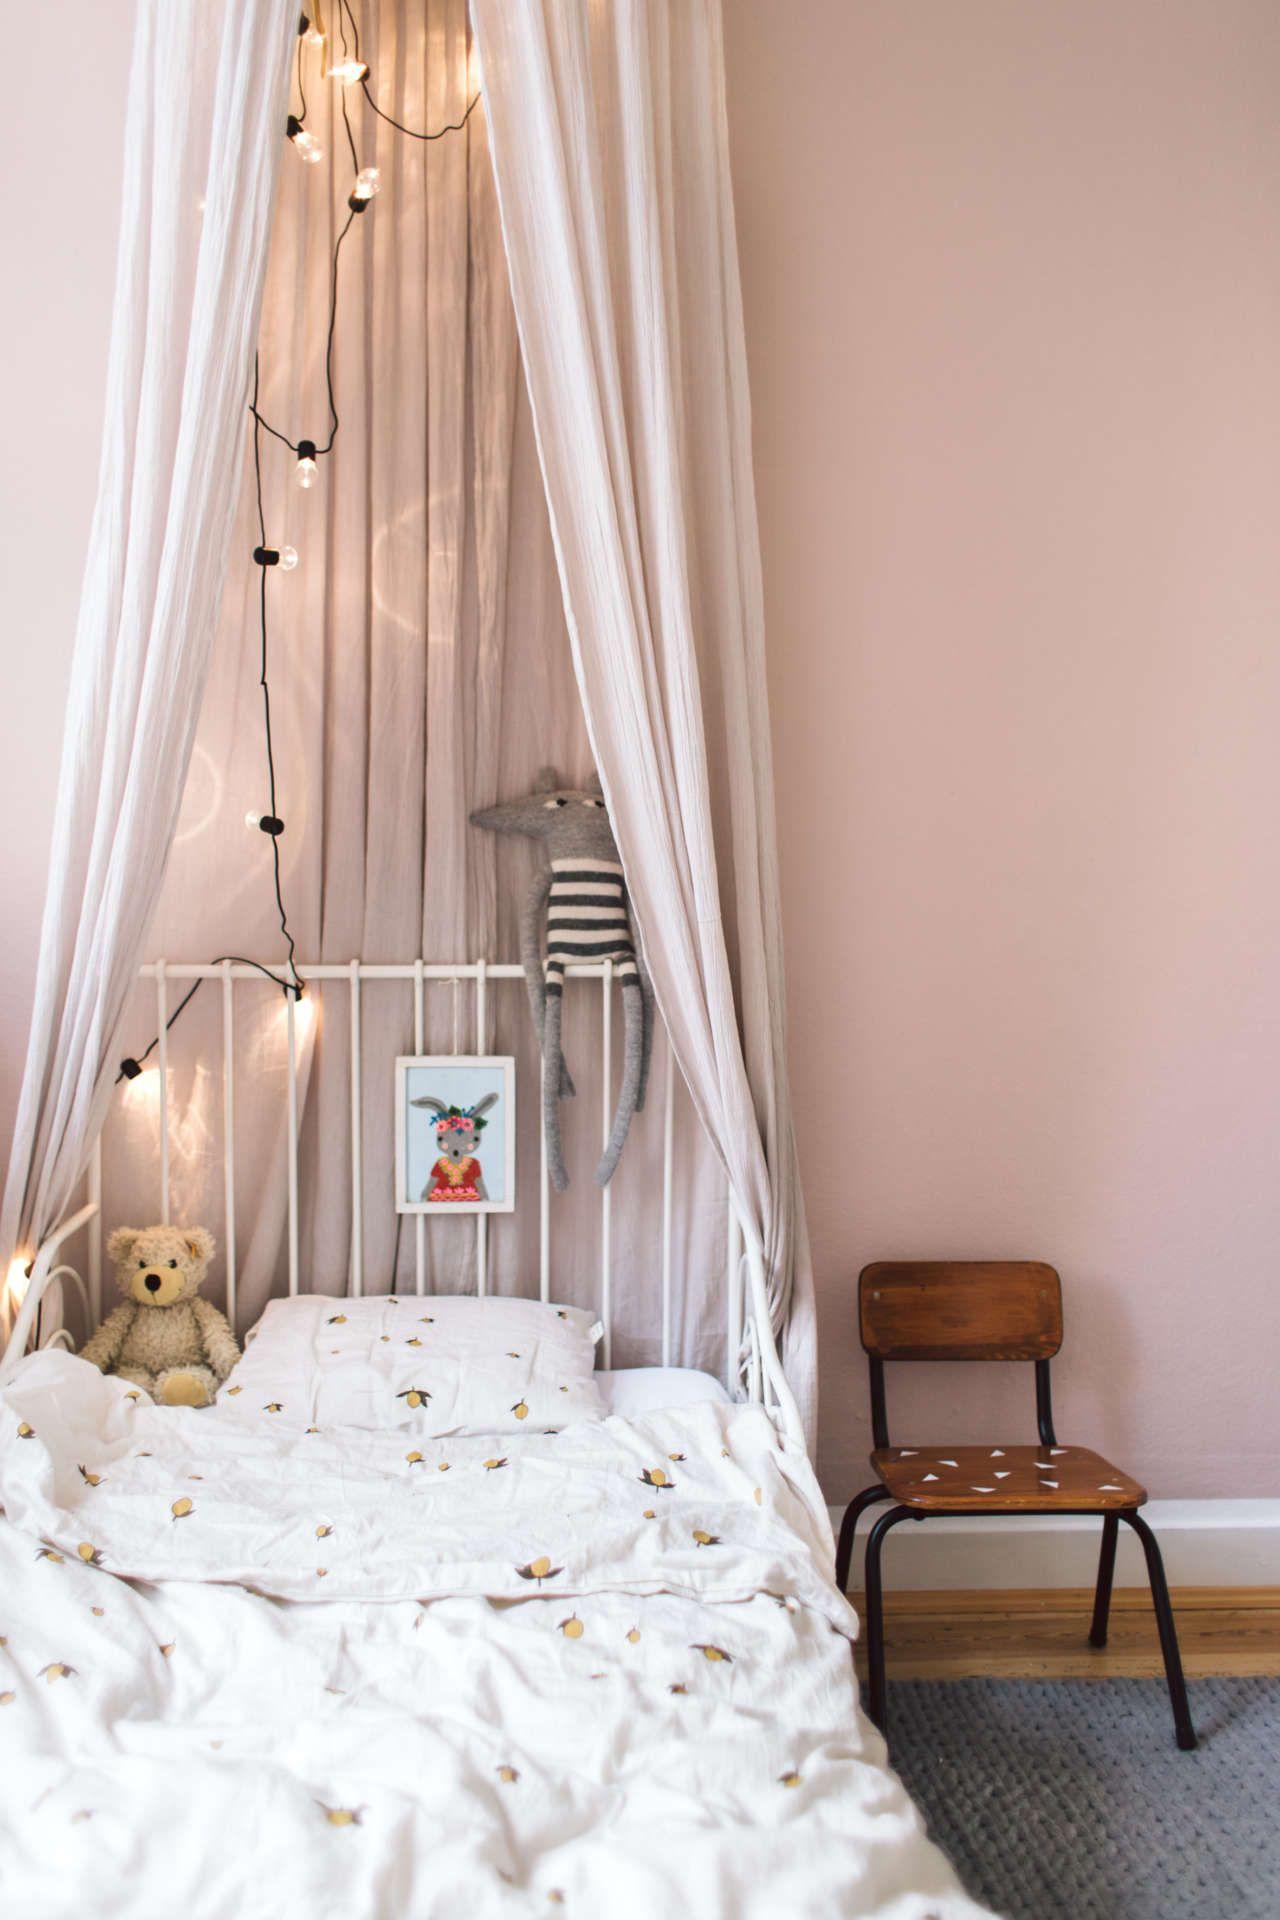 DIY Regenbogen Wanddeko in 2020 Kinderzimmerdekoration